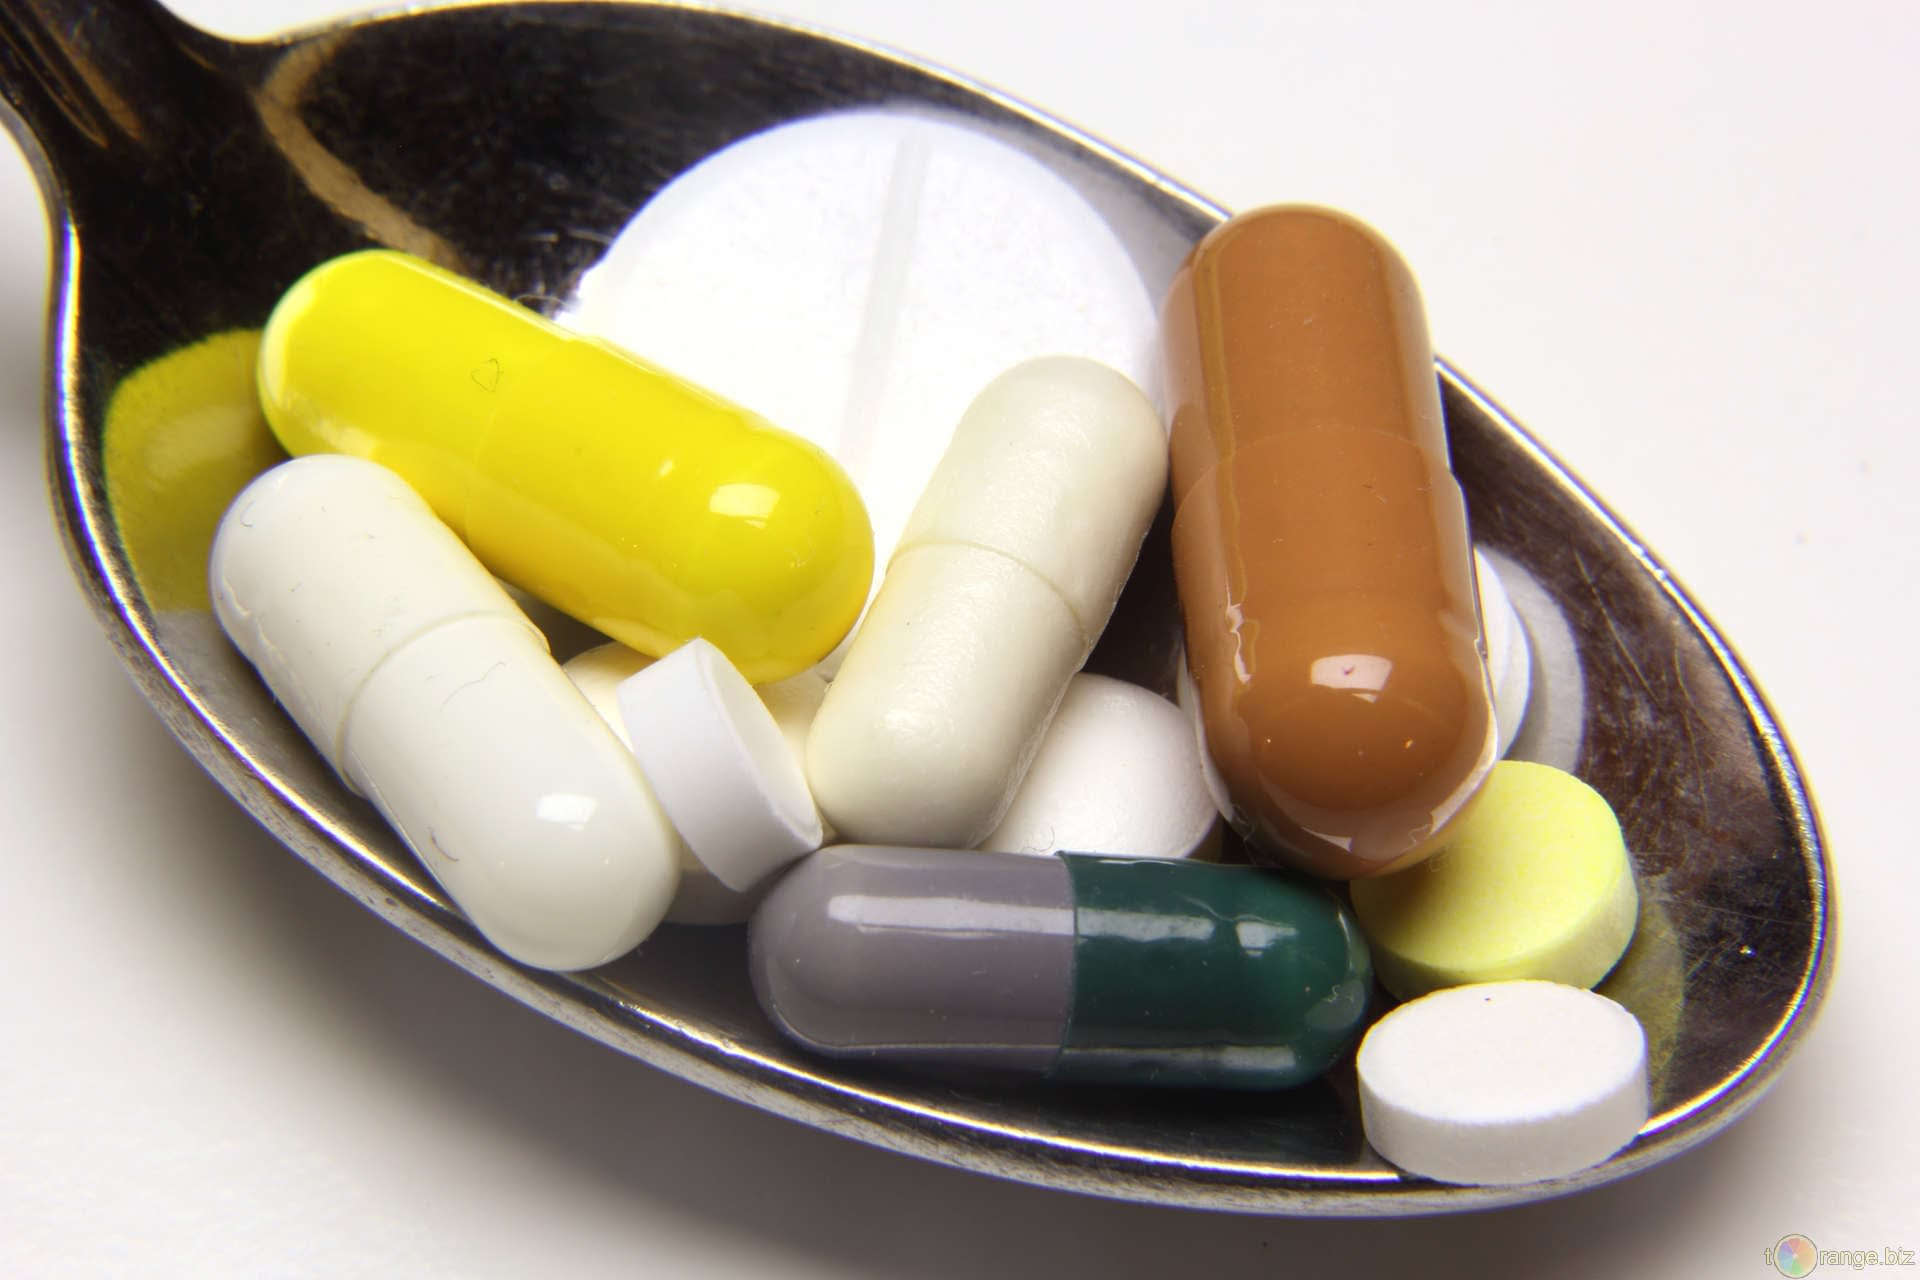 Fonte: http://torange.biz/Pills/